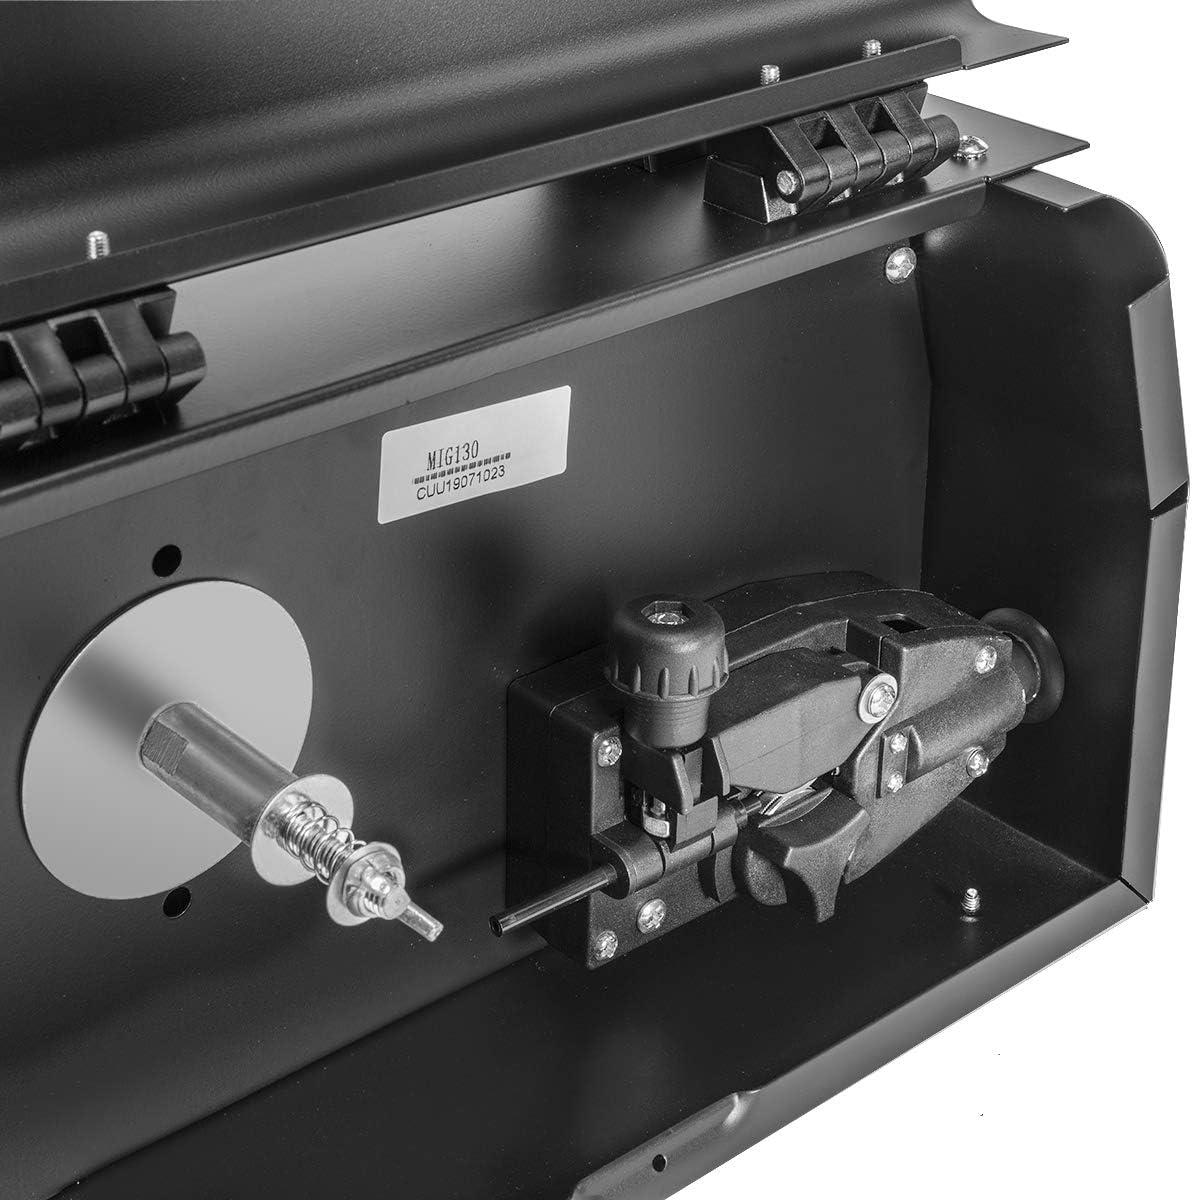 Stark MIG 130I Welder No Gas Flux Core Wire Gasless Automatic Feed Welder IGBT Inverter MIG 130 Amp Black